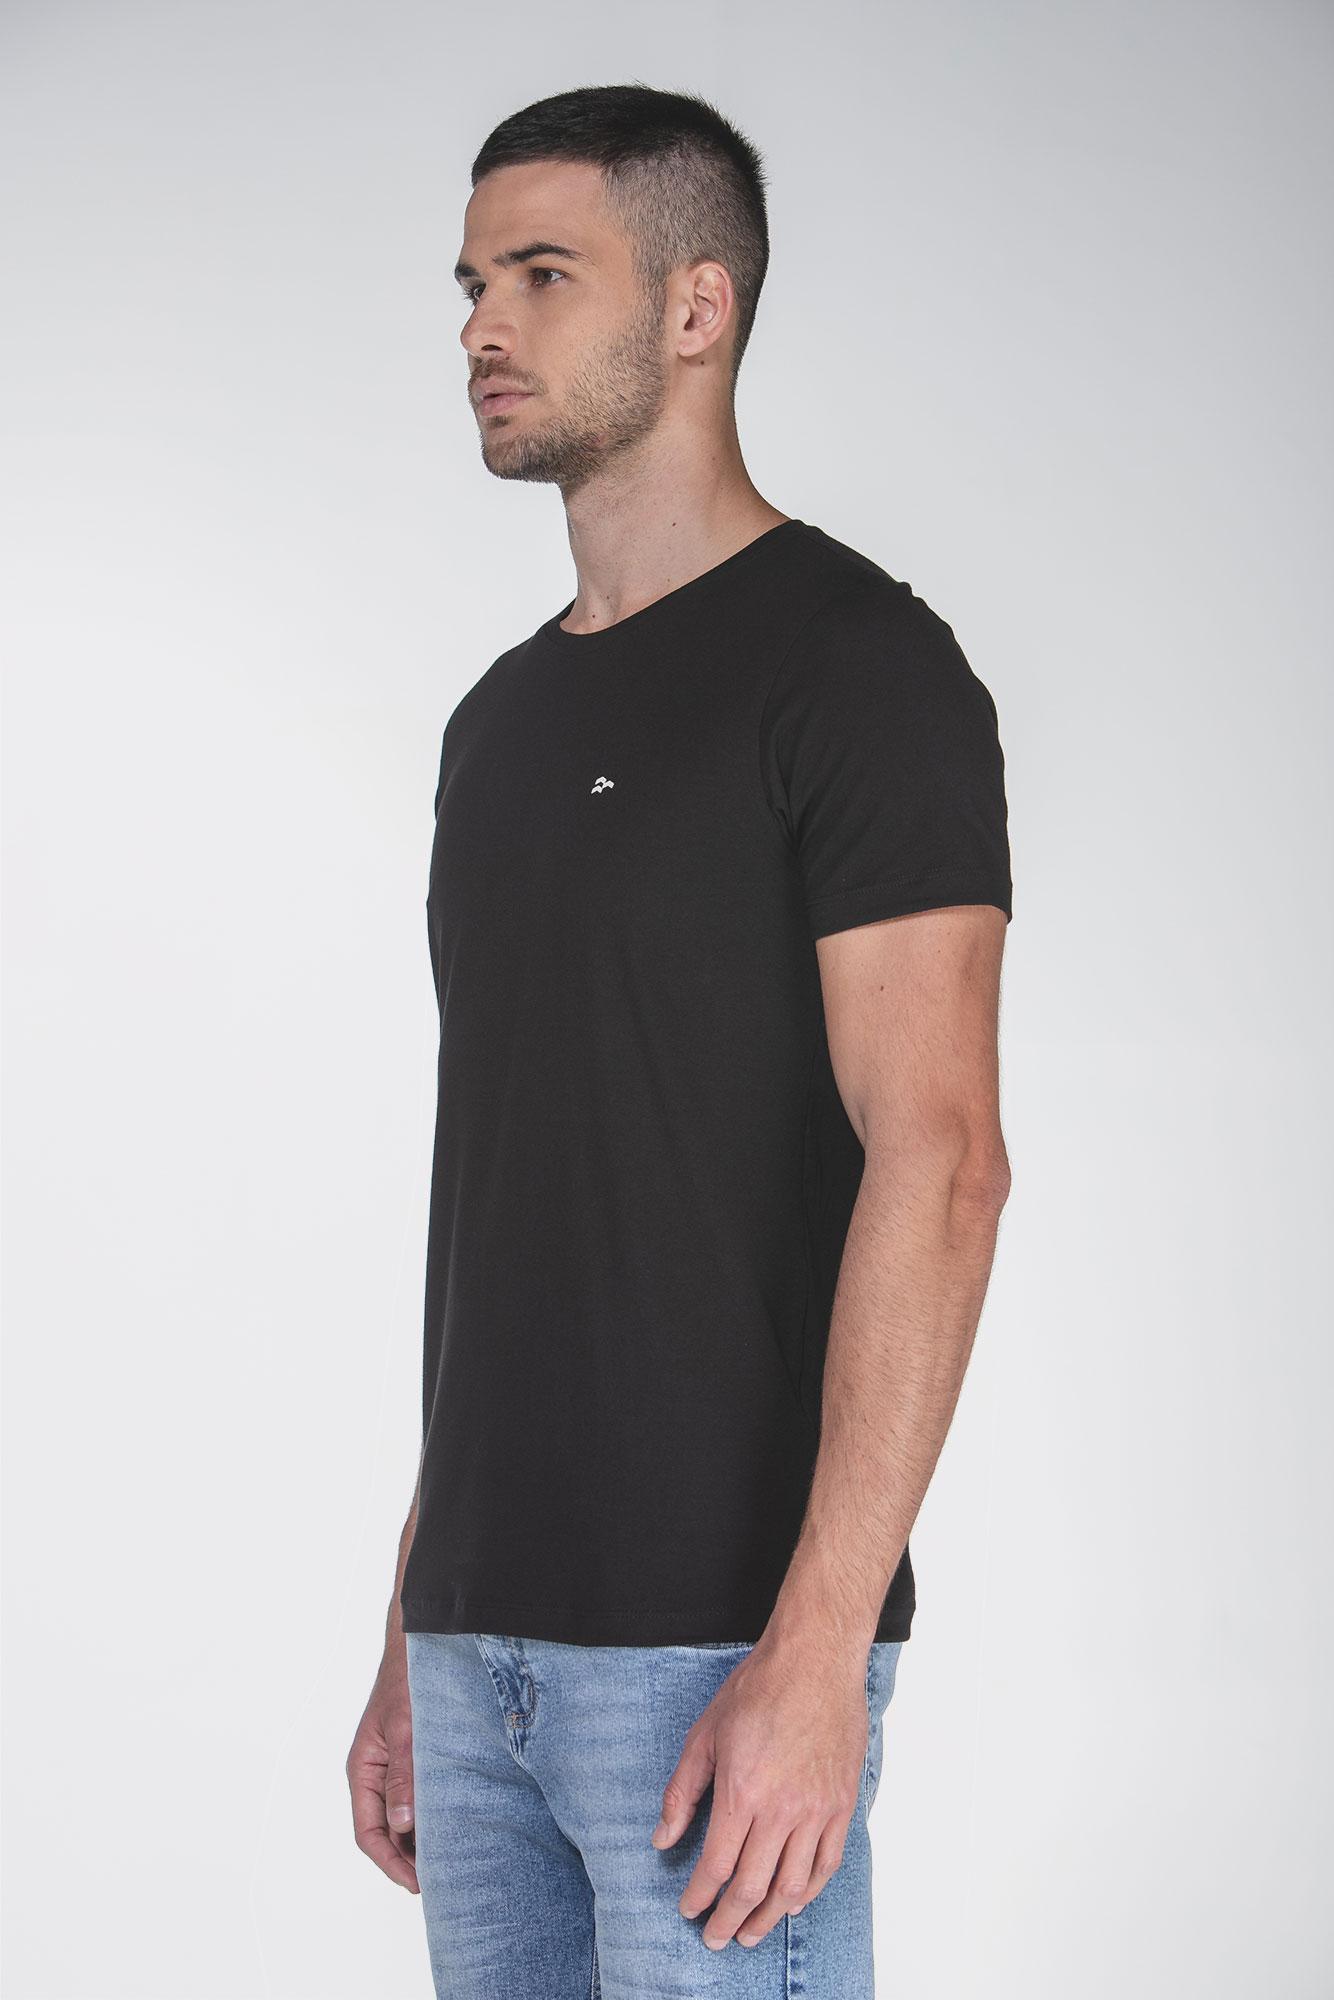 Camiseta Basic Egypt Preto/Branco